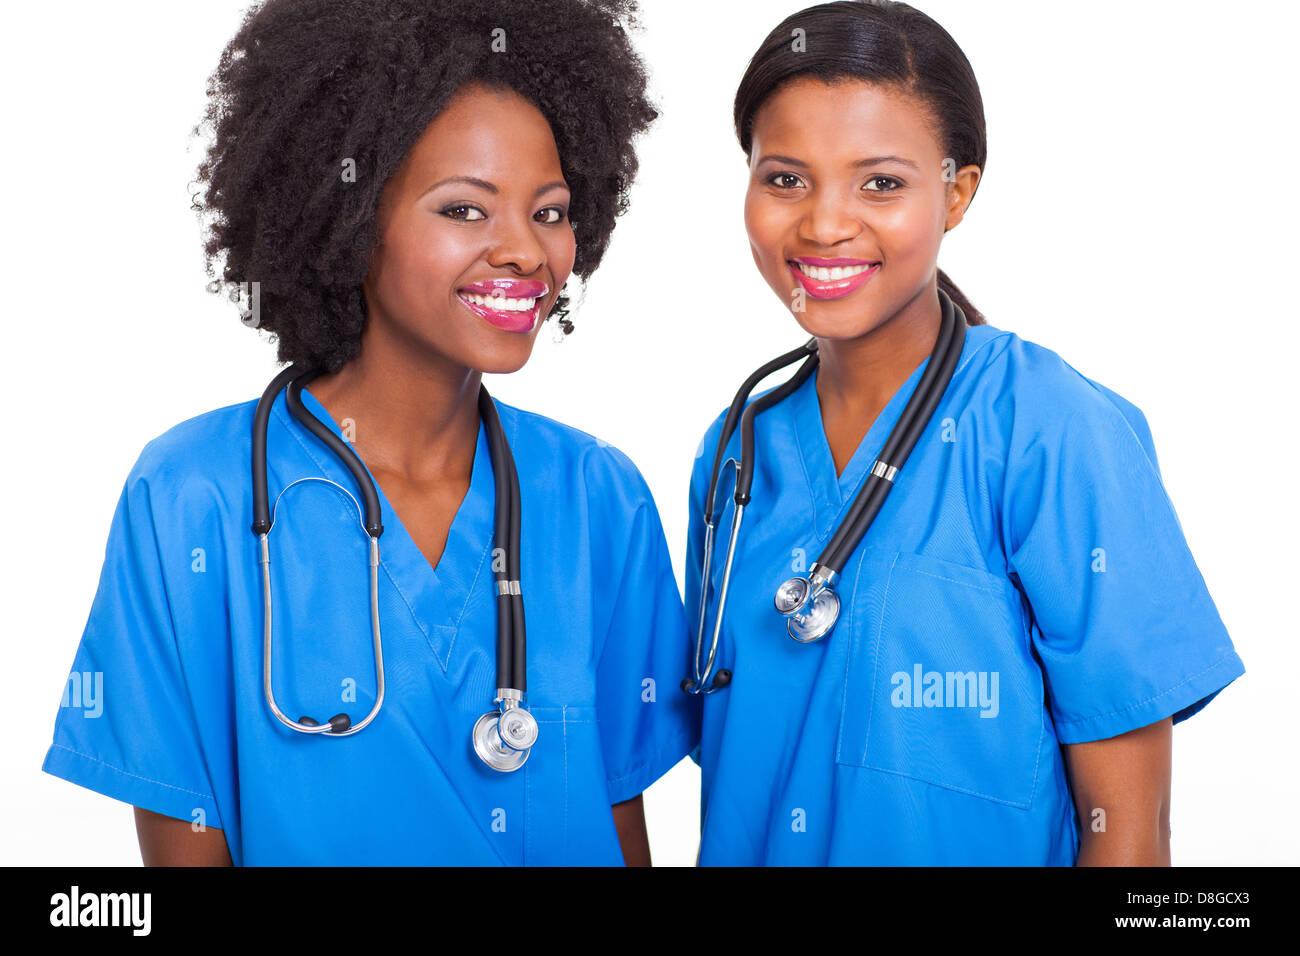 De belles infirmières stagiaires african Photo Stock